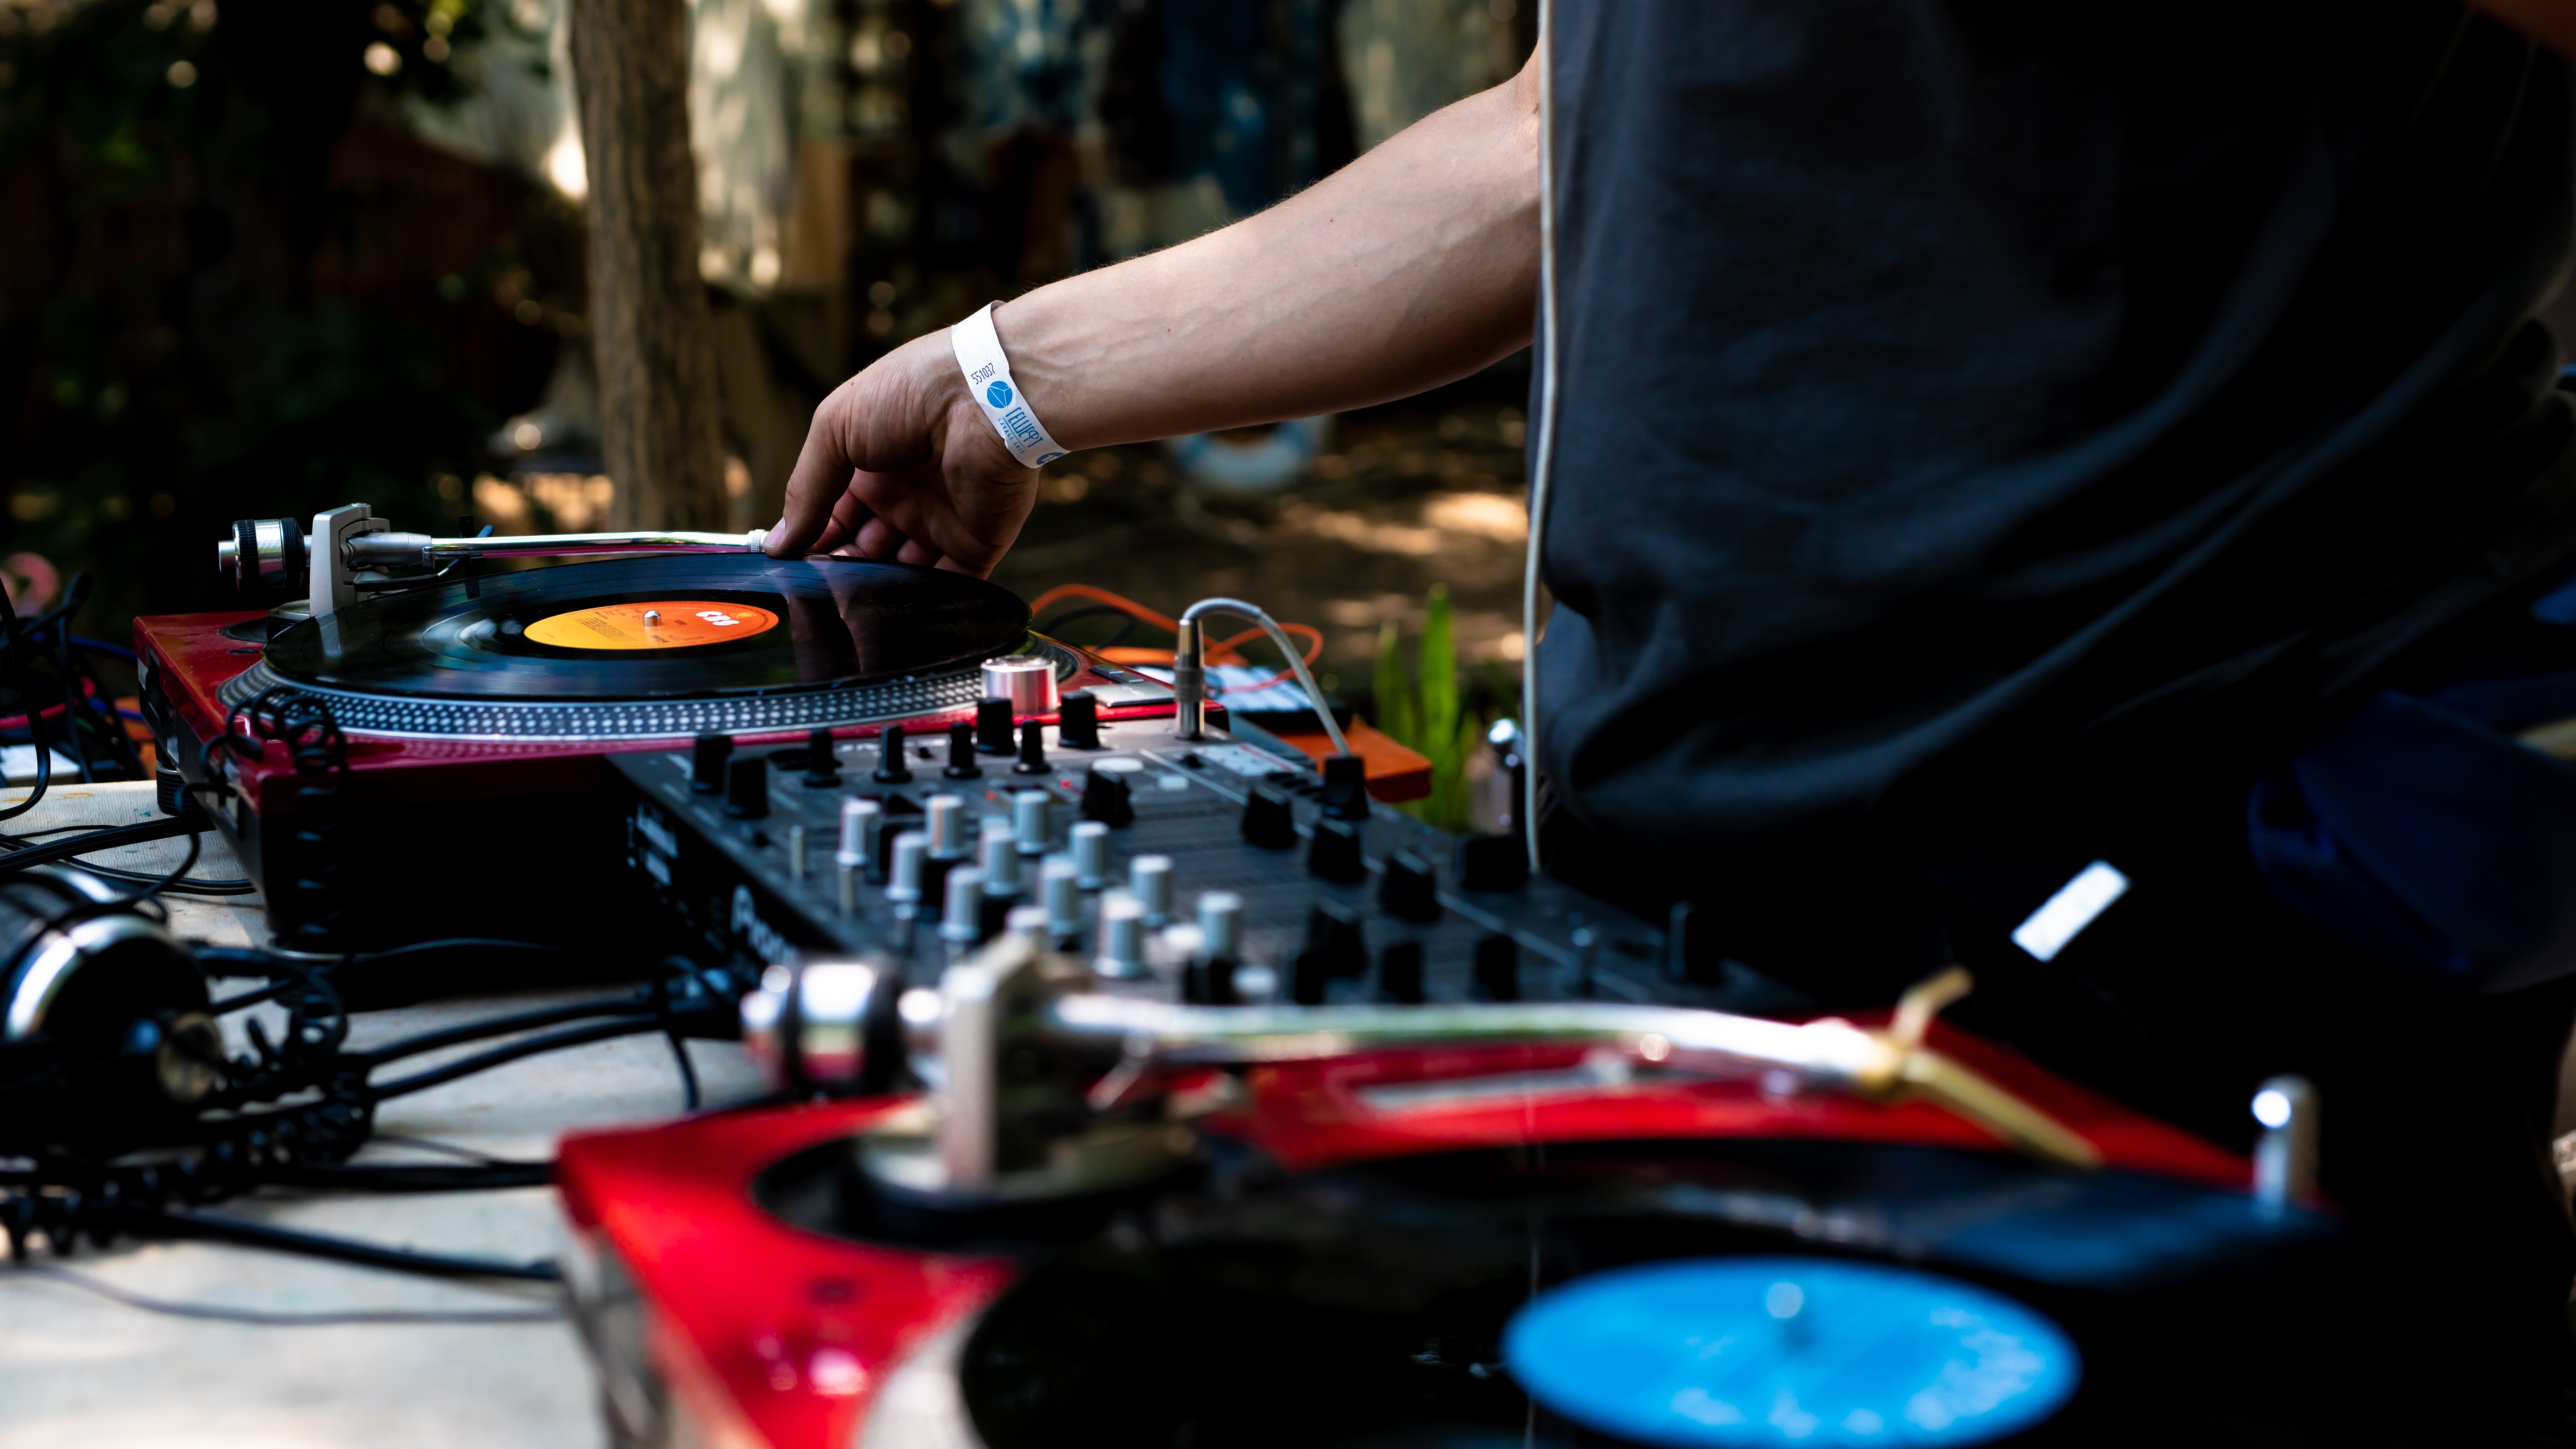 ¿En qué se diferencia una controladora DJ de una mesa de mezclas? - Imagen